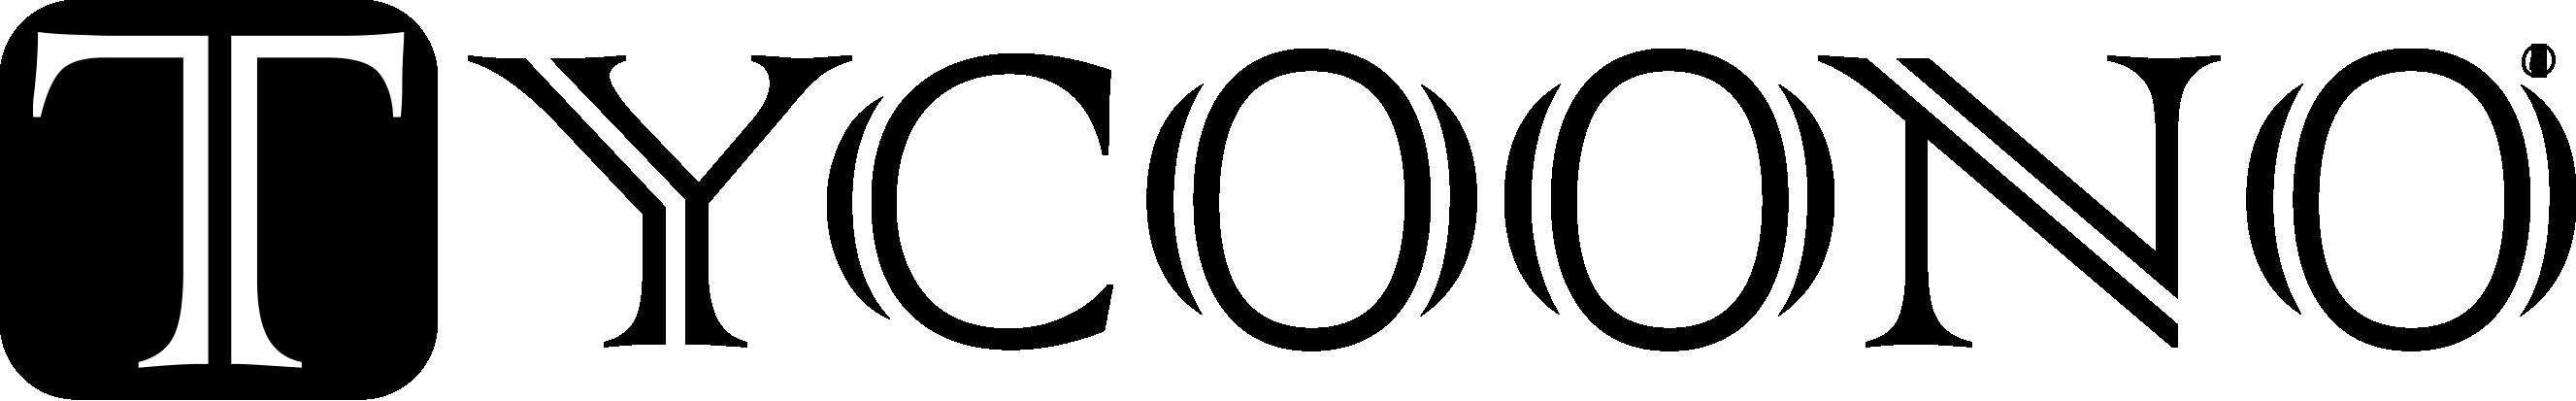 Tycoono® Logo